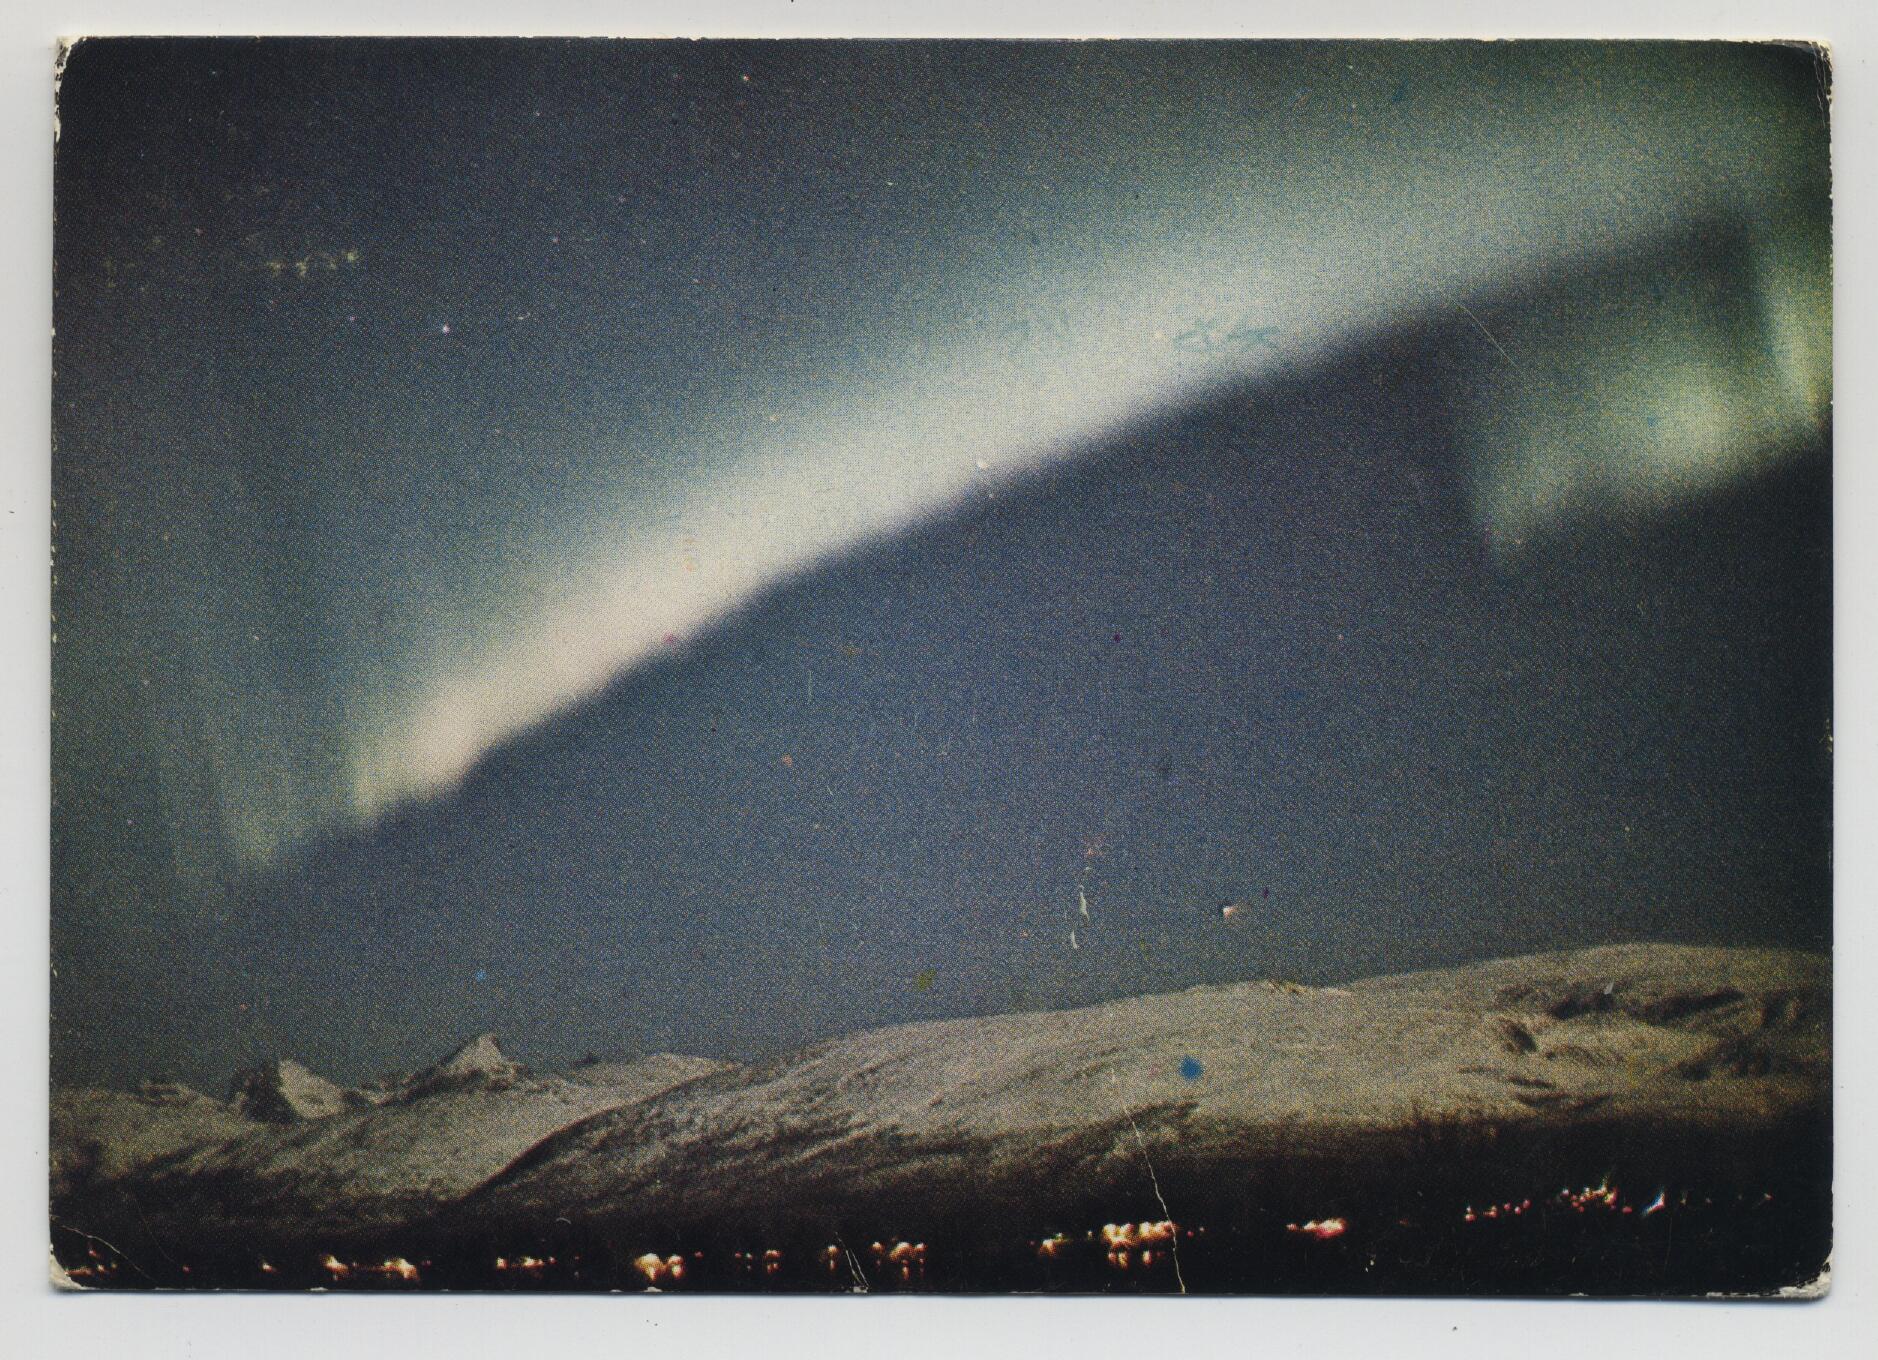 53_northernlightsfront.jpg